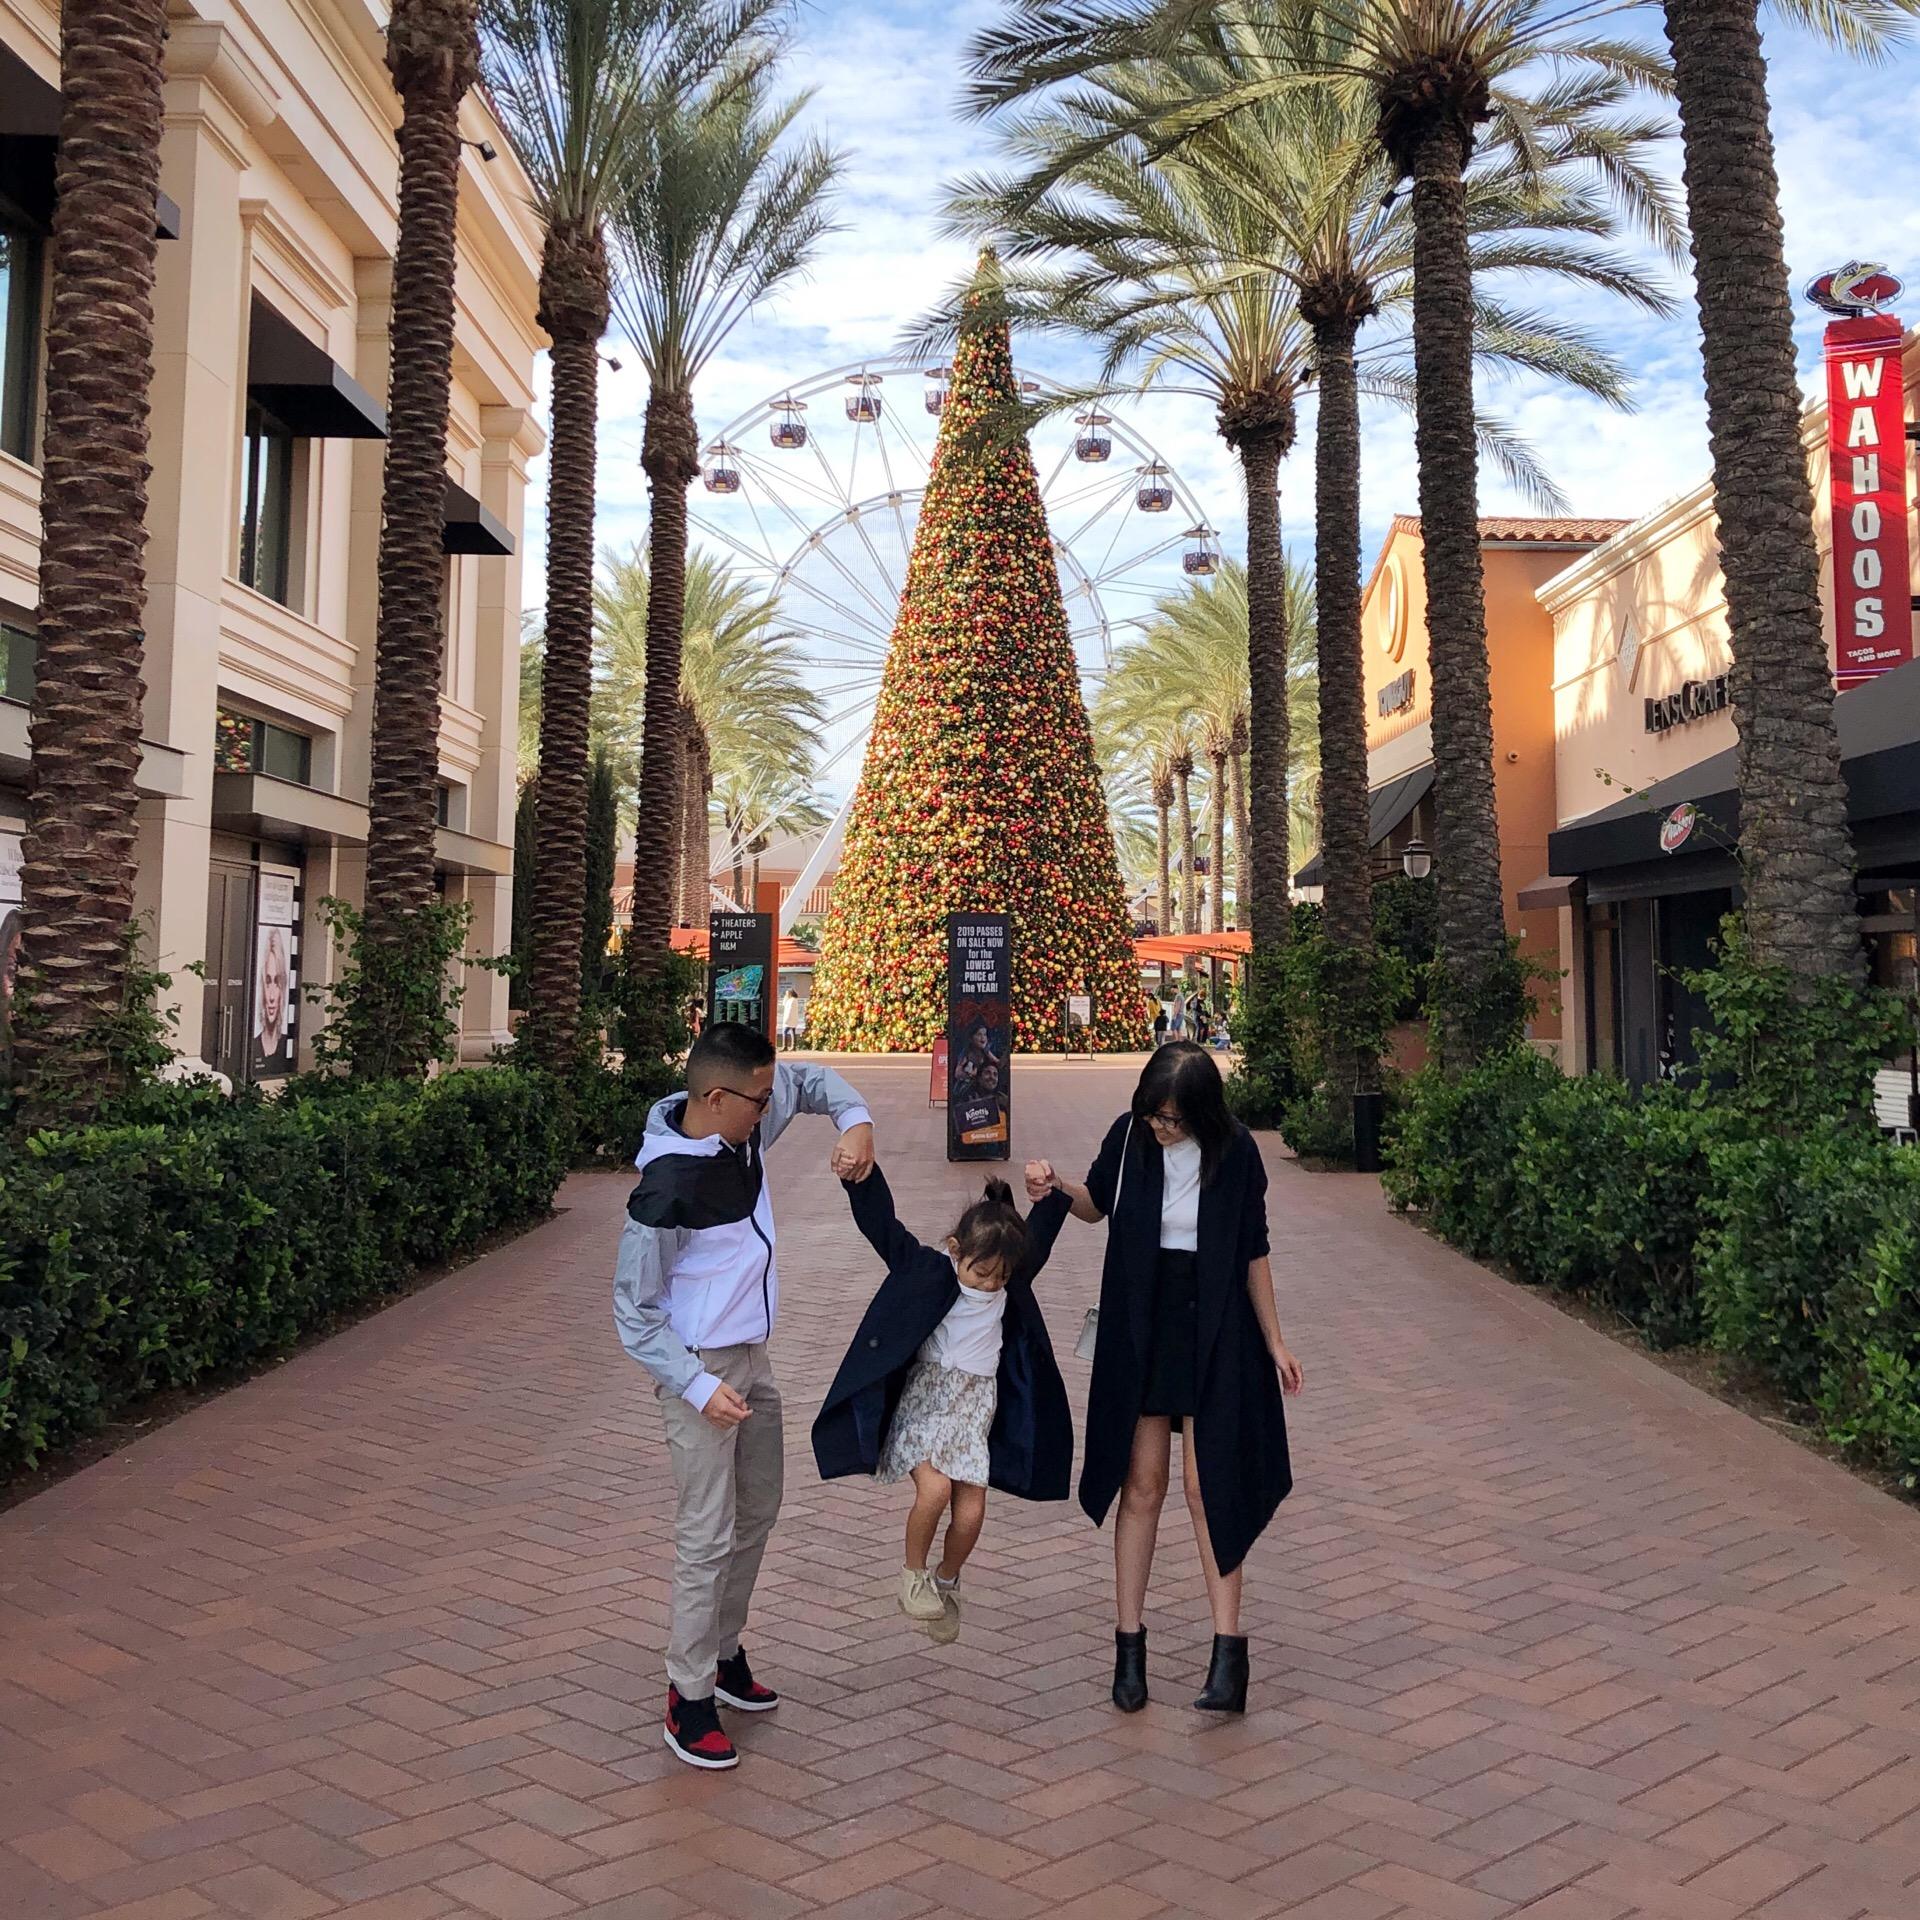 Irvine Spectrum Center on meethaha.com